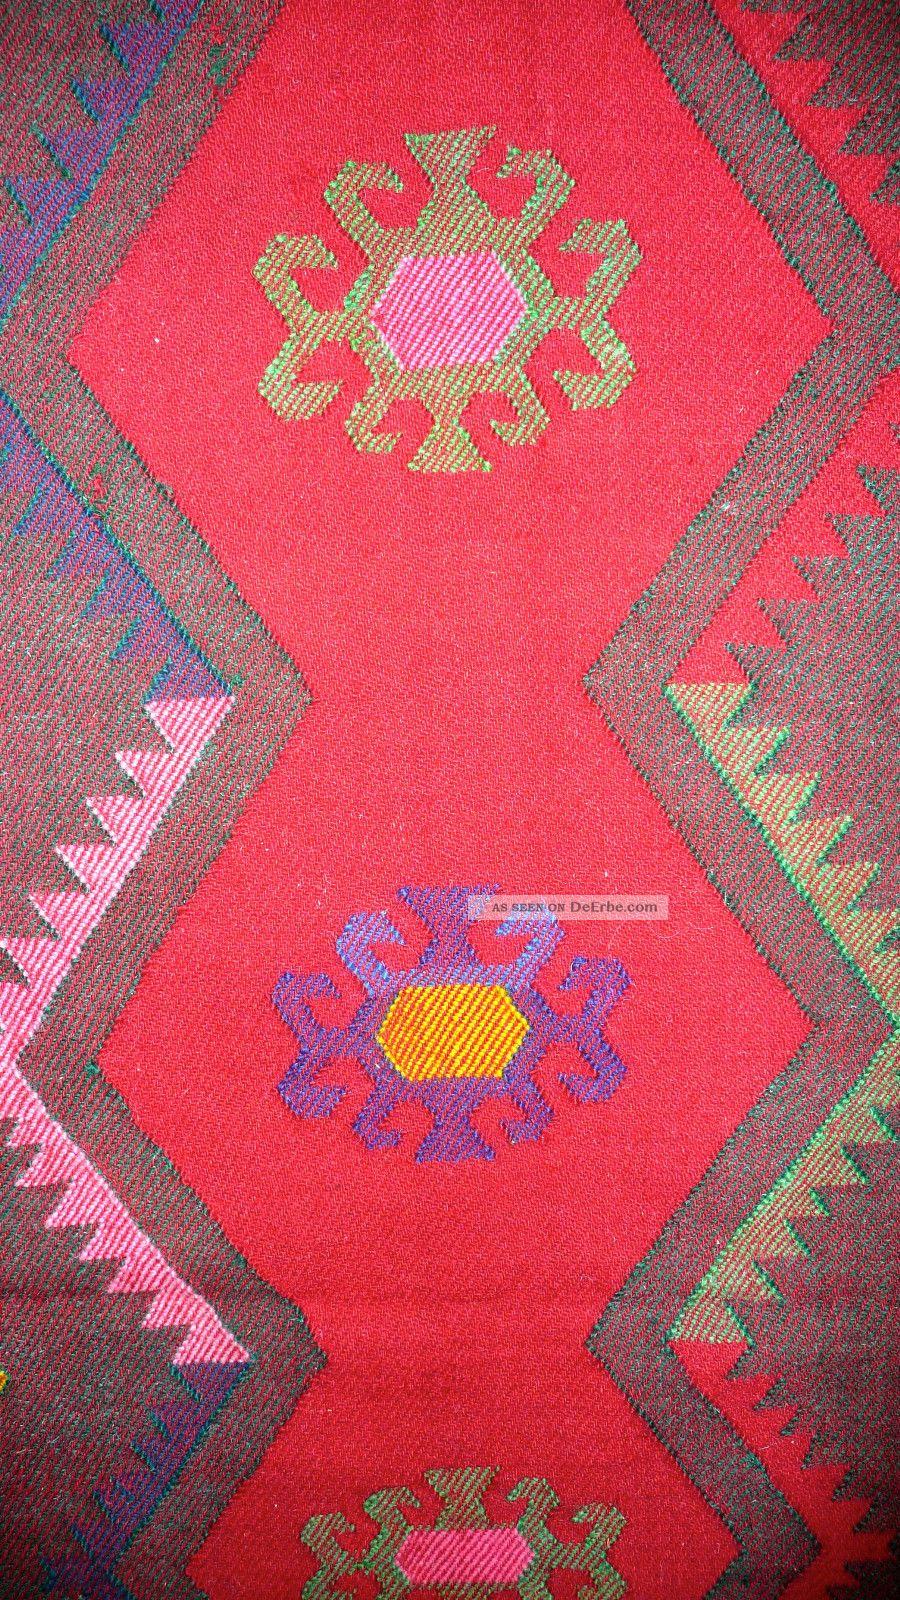 teppich muster handgekn pft 80 100jahre alt ex jugoslawien balkan montenegro. Black Bedroom Furniture Sets. Home Design Ideas